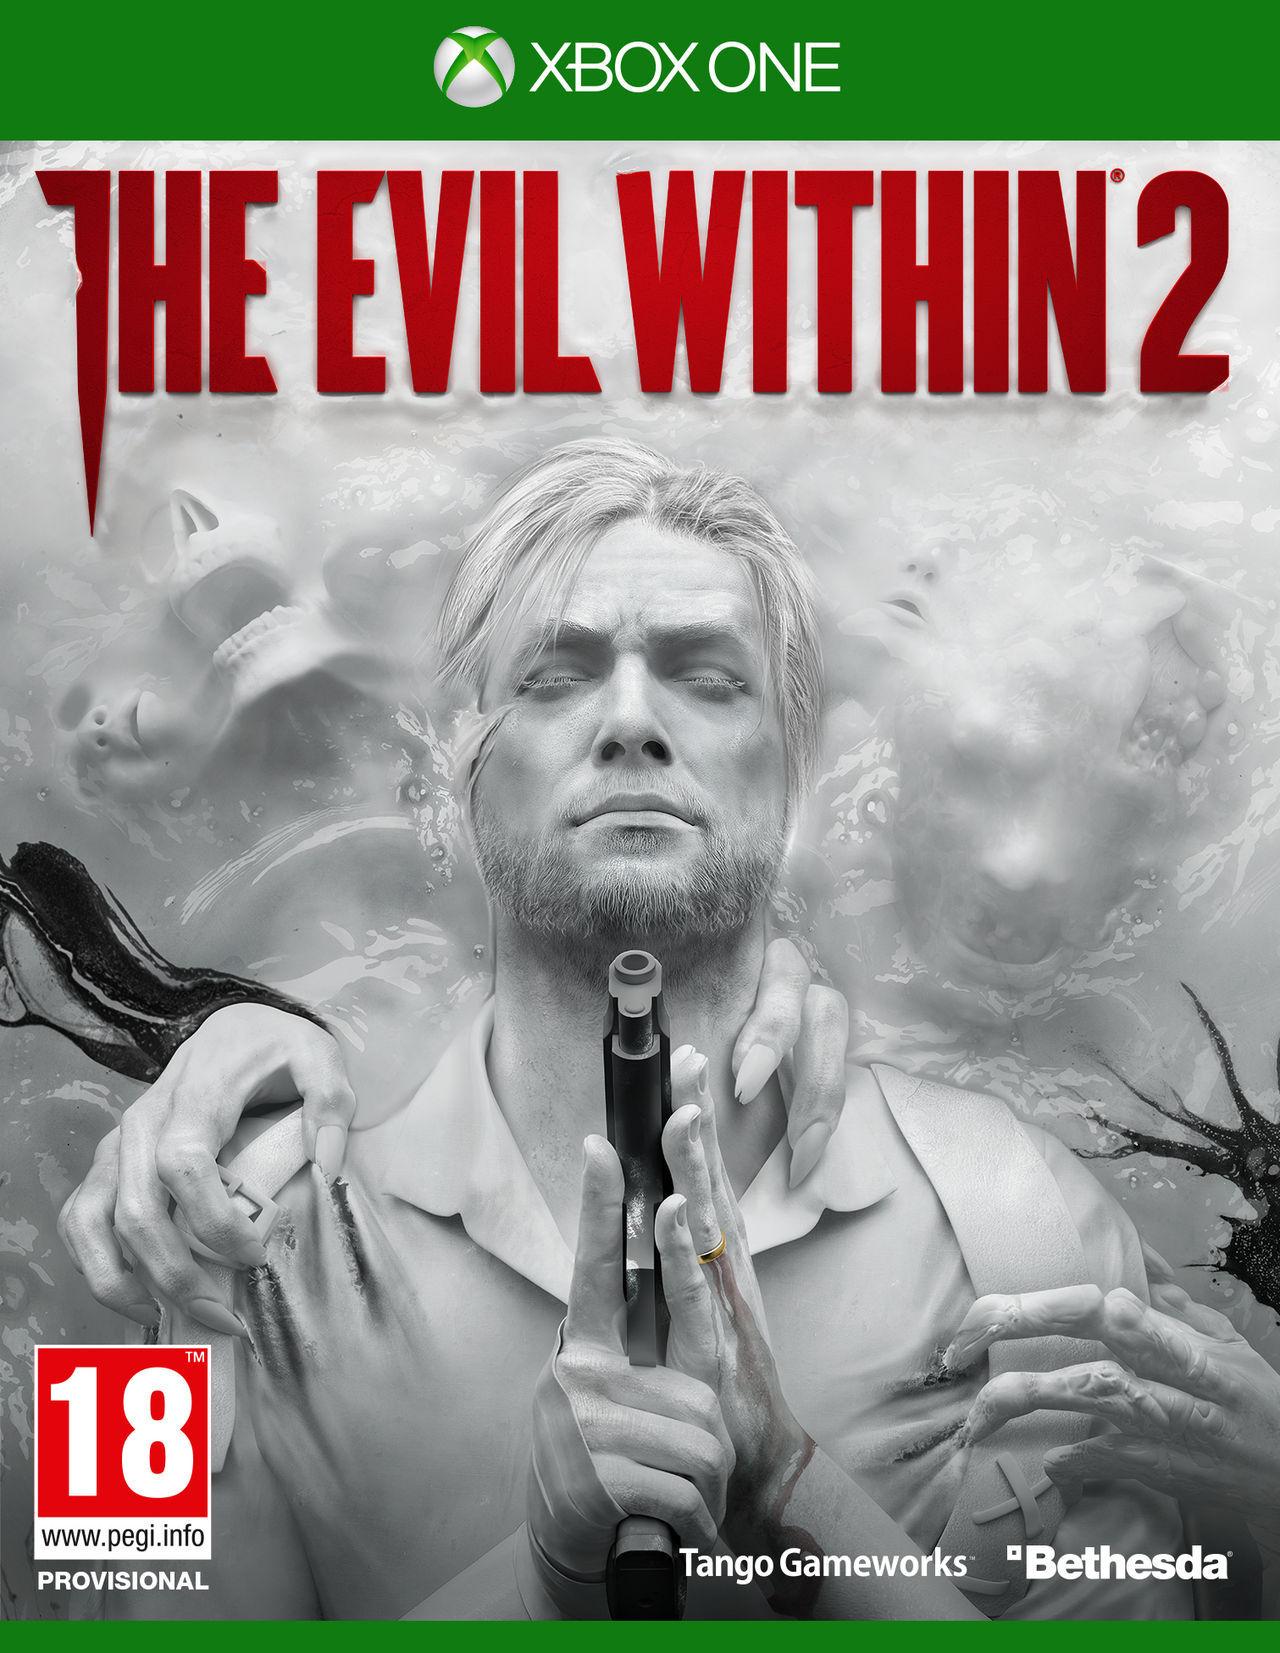 Imagen 1 de The Evil Within 2 para Xbox One